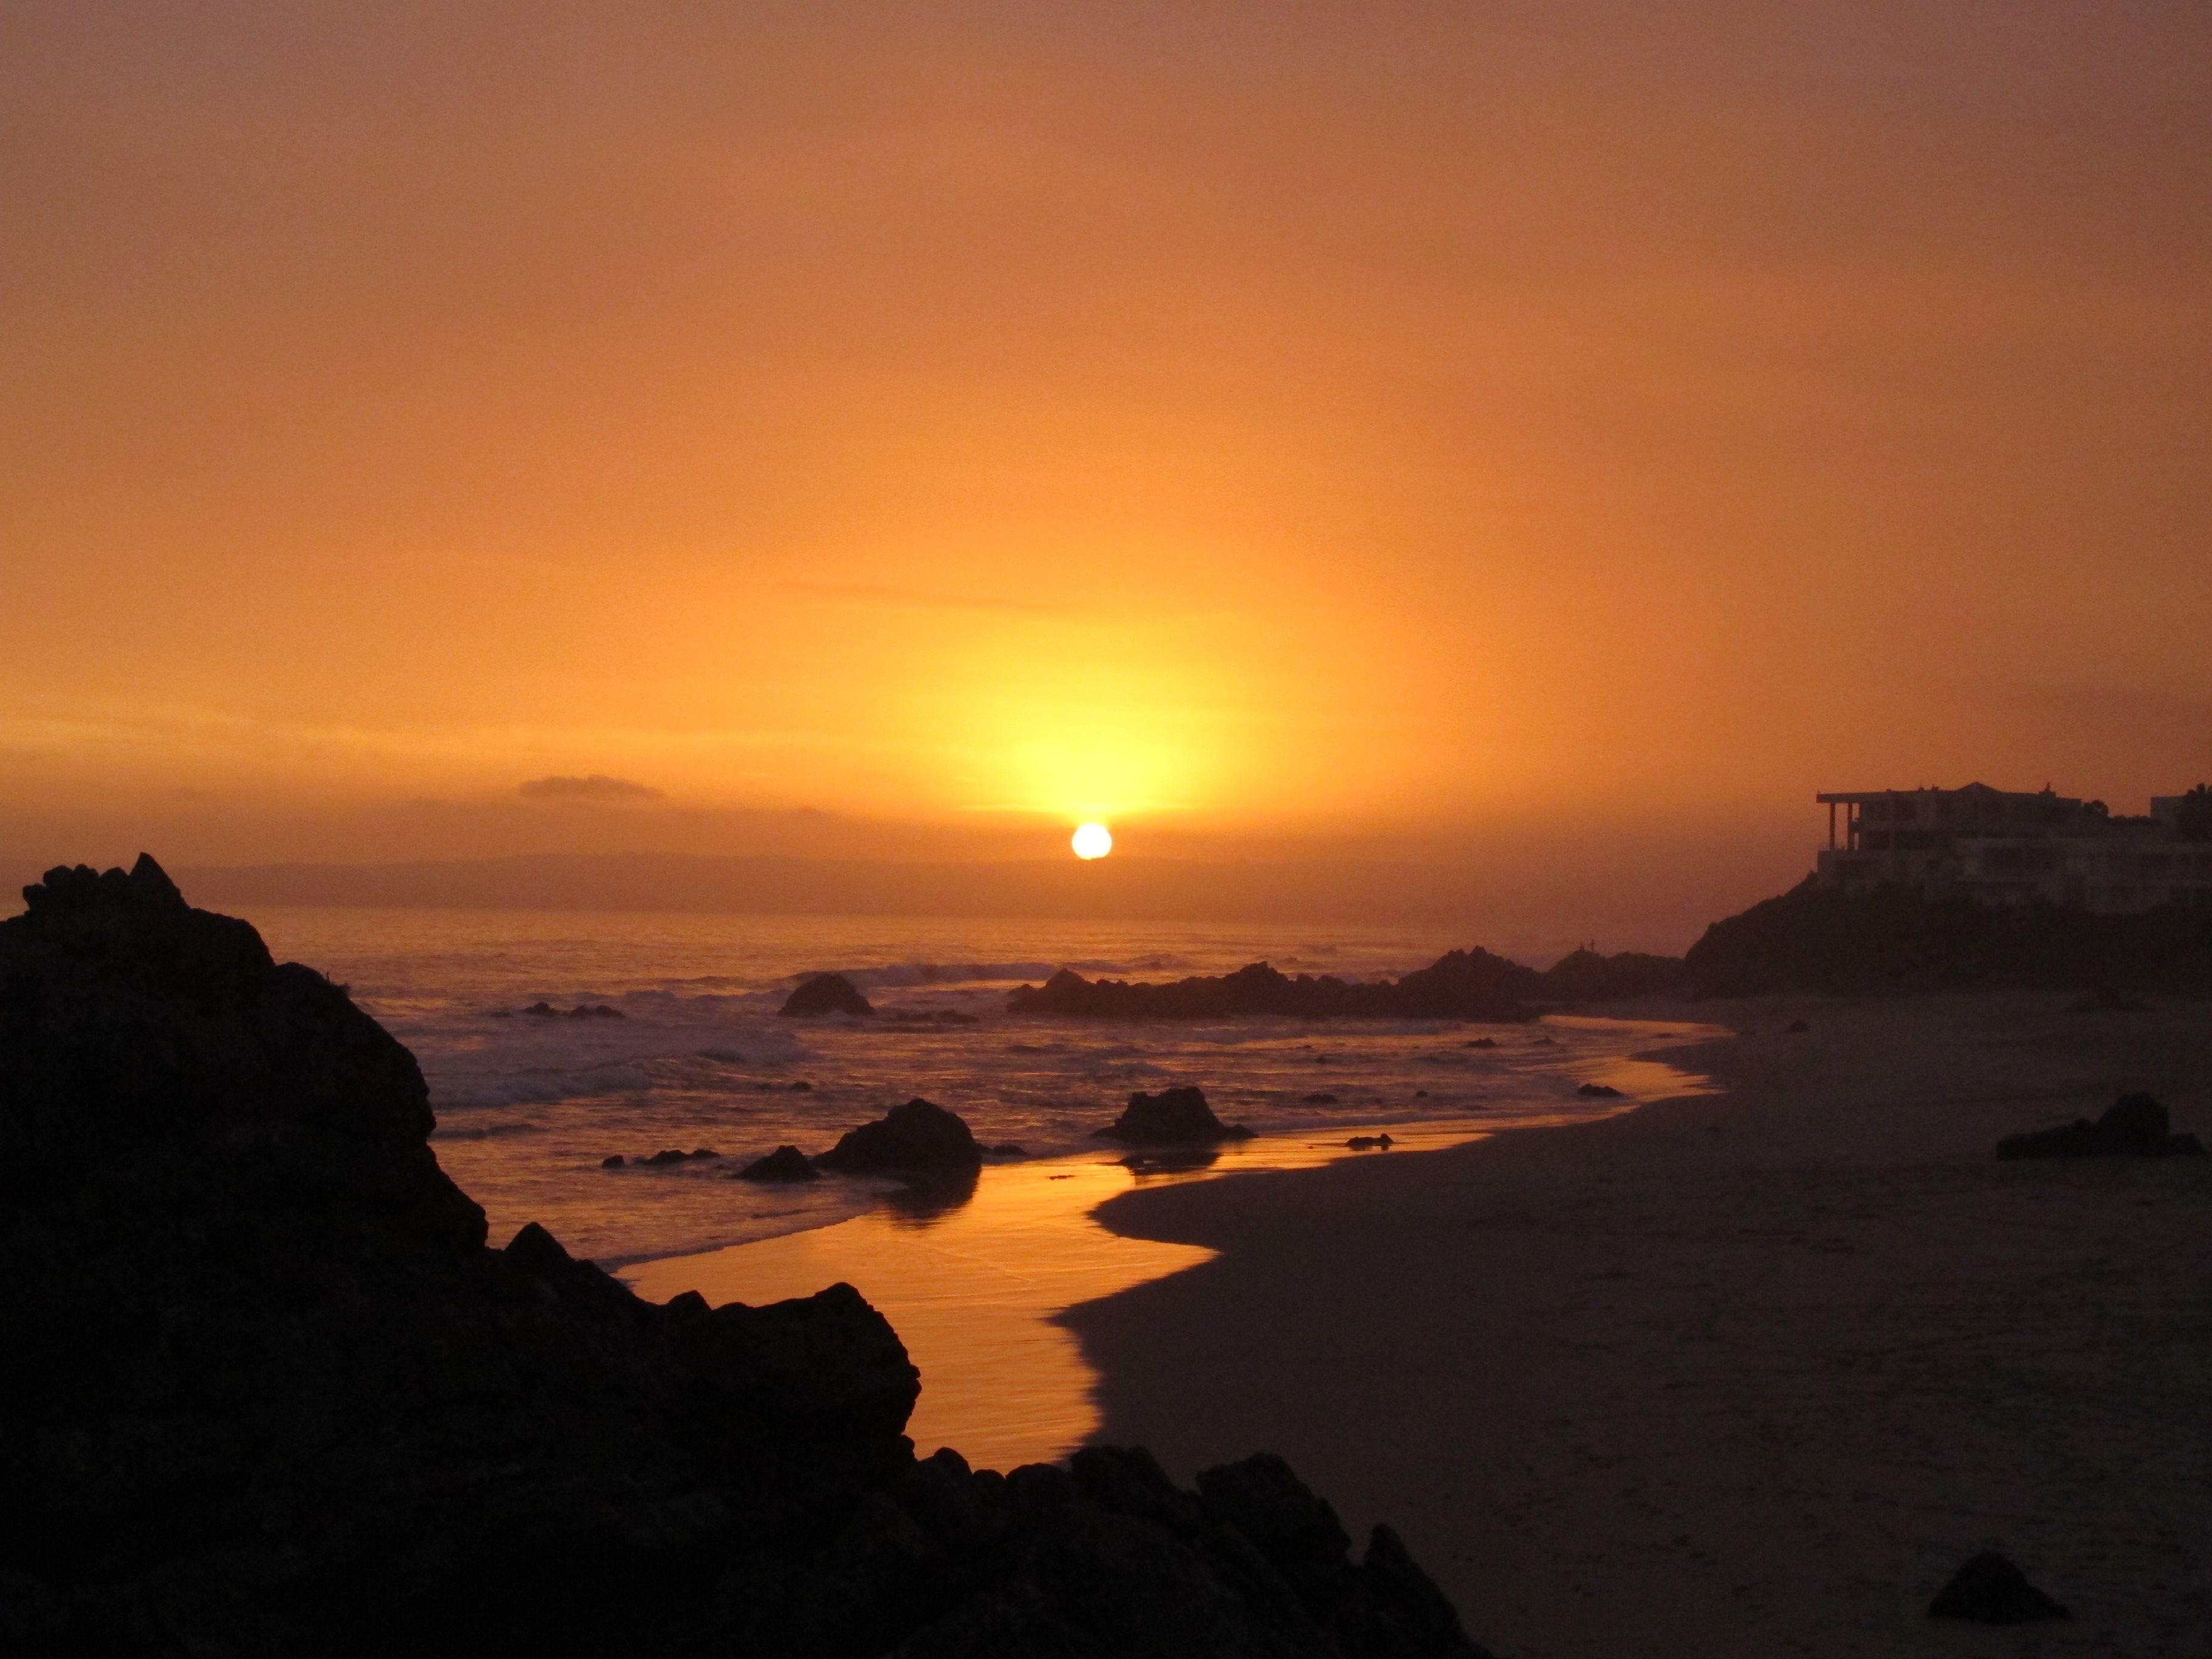 ... on the Indian Ocean Coastline   Beautiful South Africa   Pinte